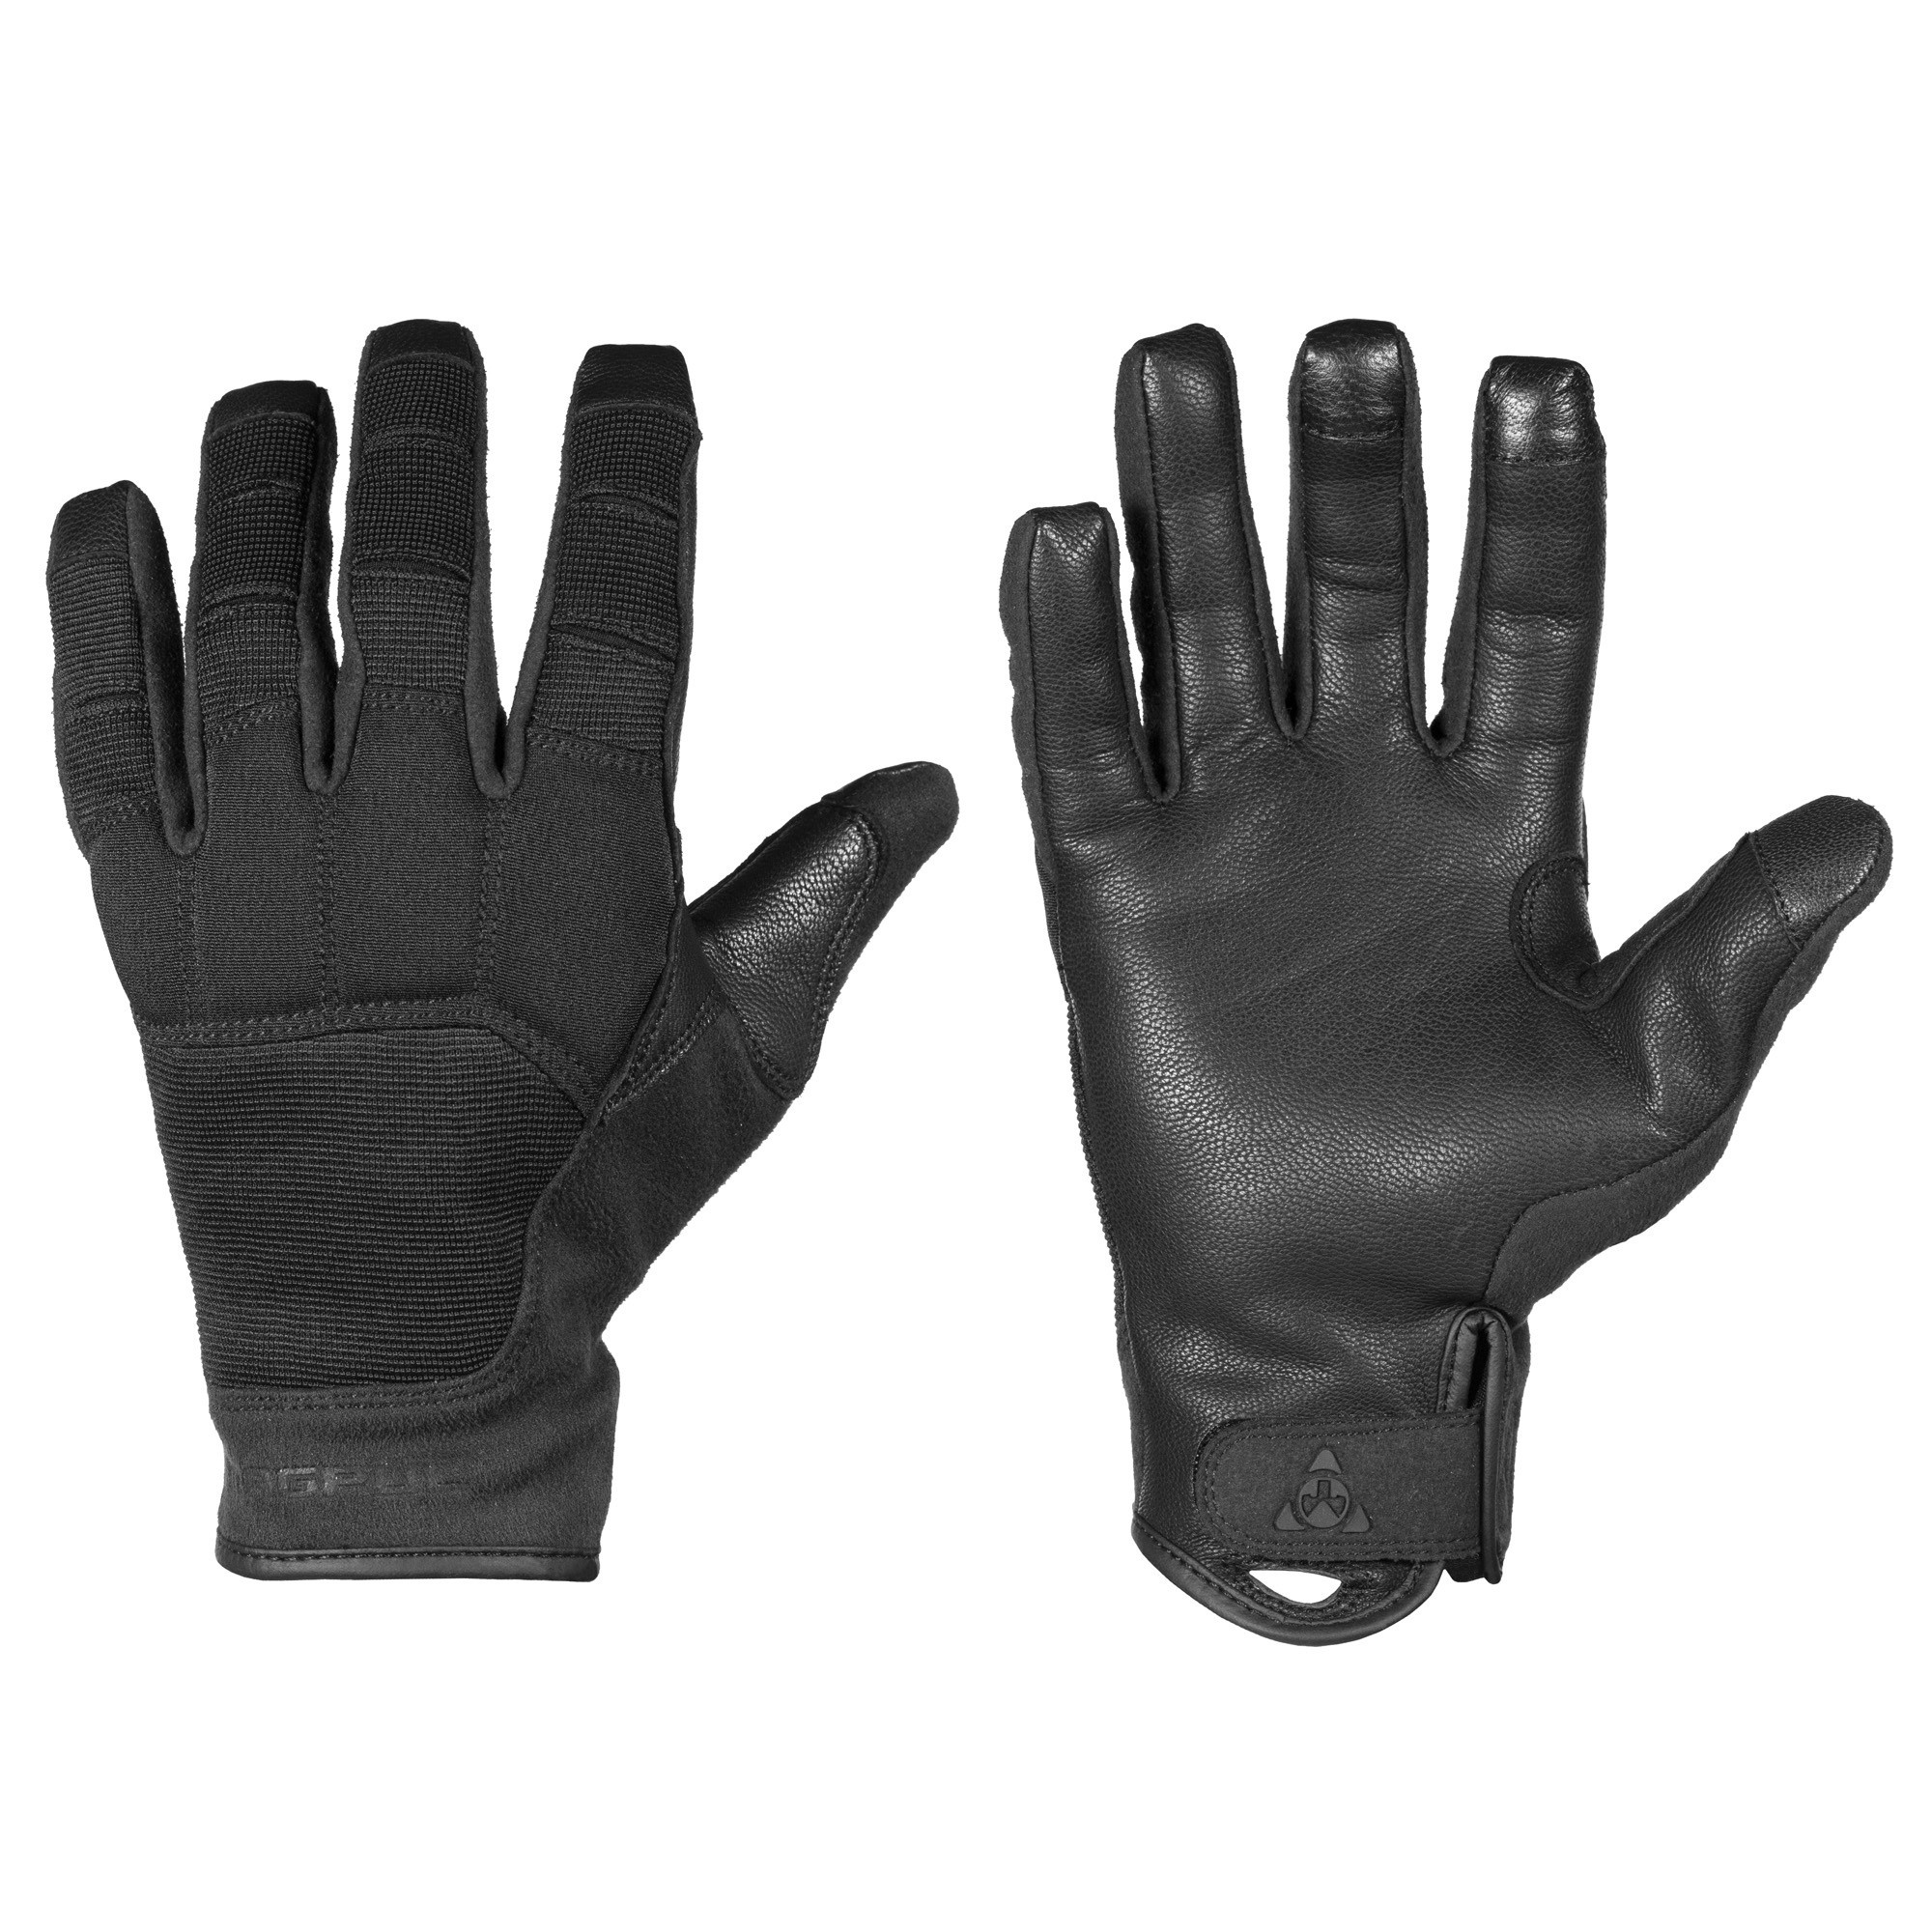 Magpul Core Patrol Gloves